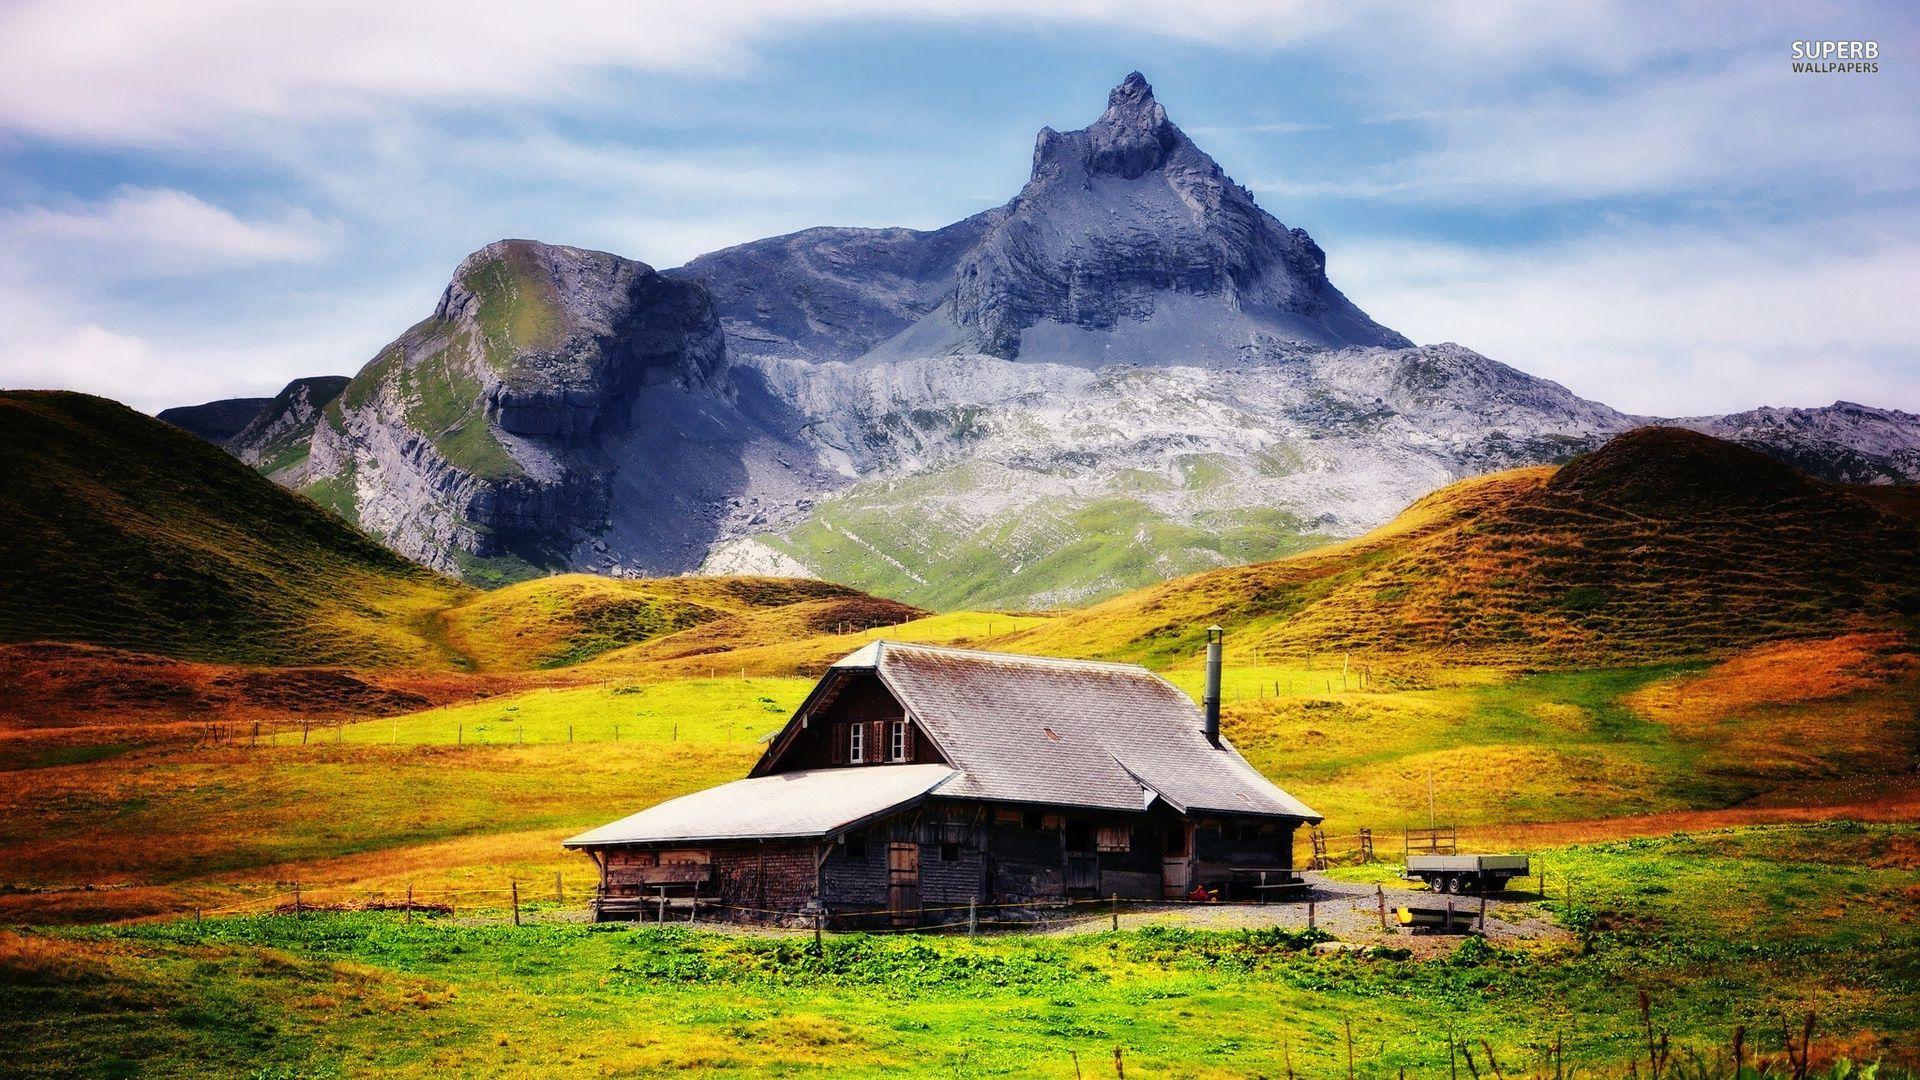 Kućice na  vrhu planine B5ed595c53f01bef1c4f11c85d8522d7